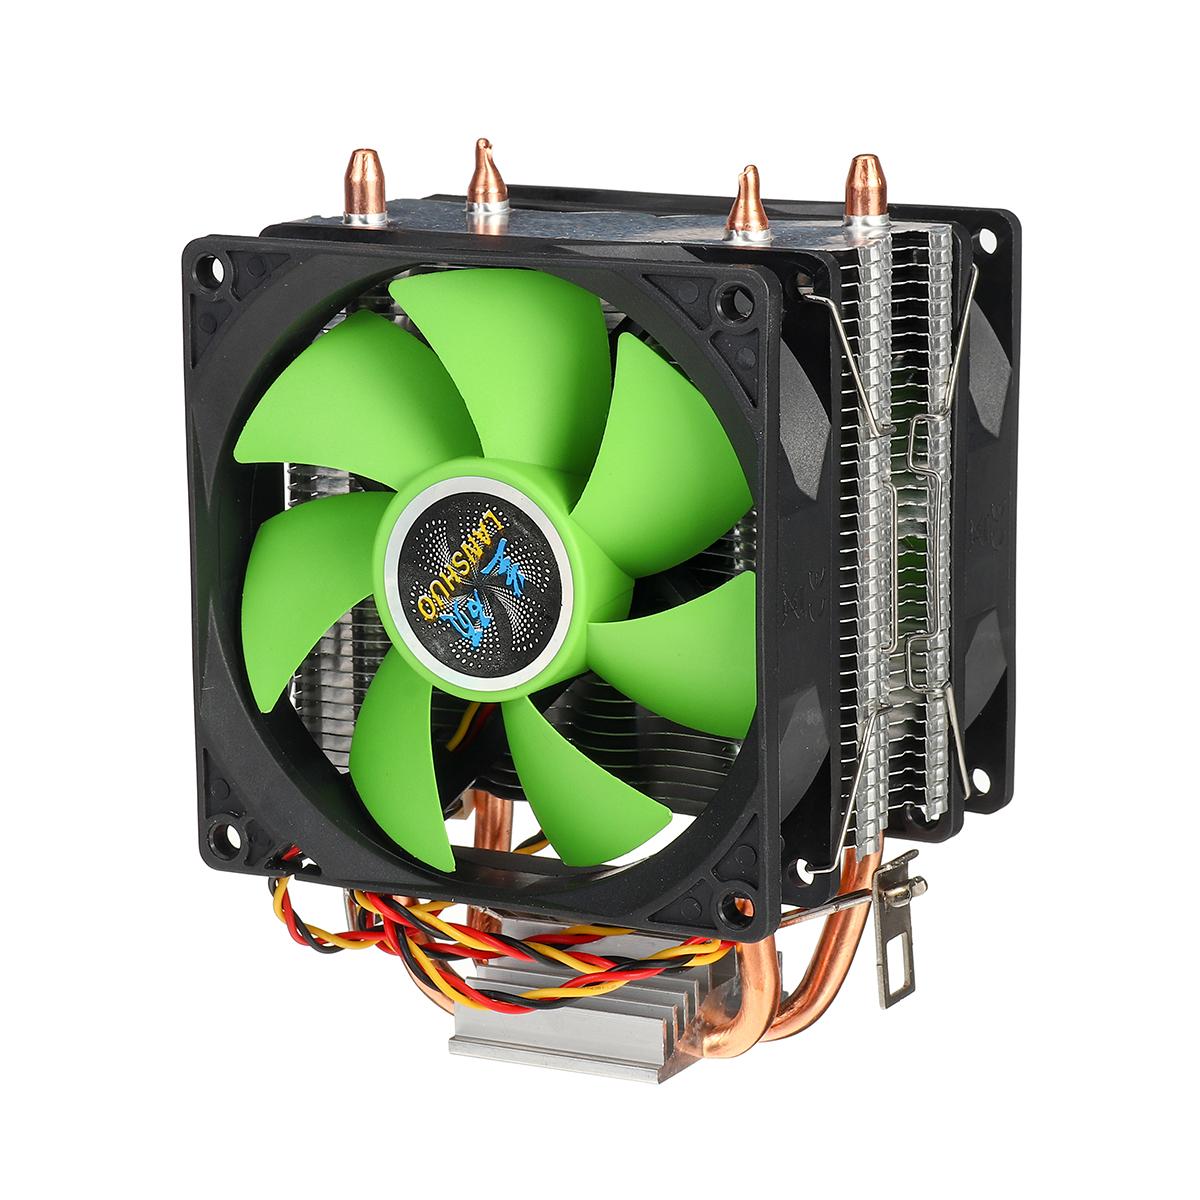 90mm 3Pin CPU Cooler Heatsink Quiet Fans For Intel LGA775/1156/1155 For AMD/AM2/AM3 Dual-sided Fan